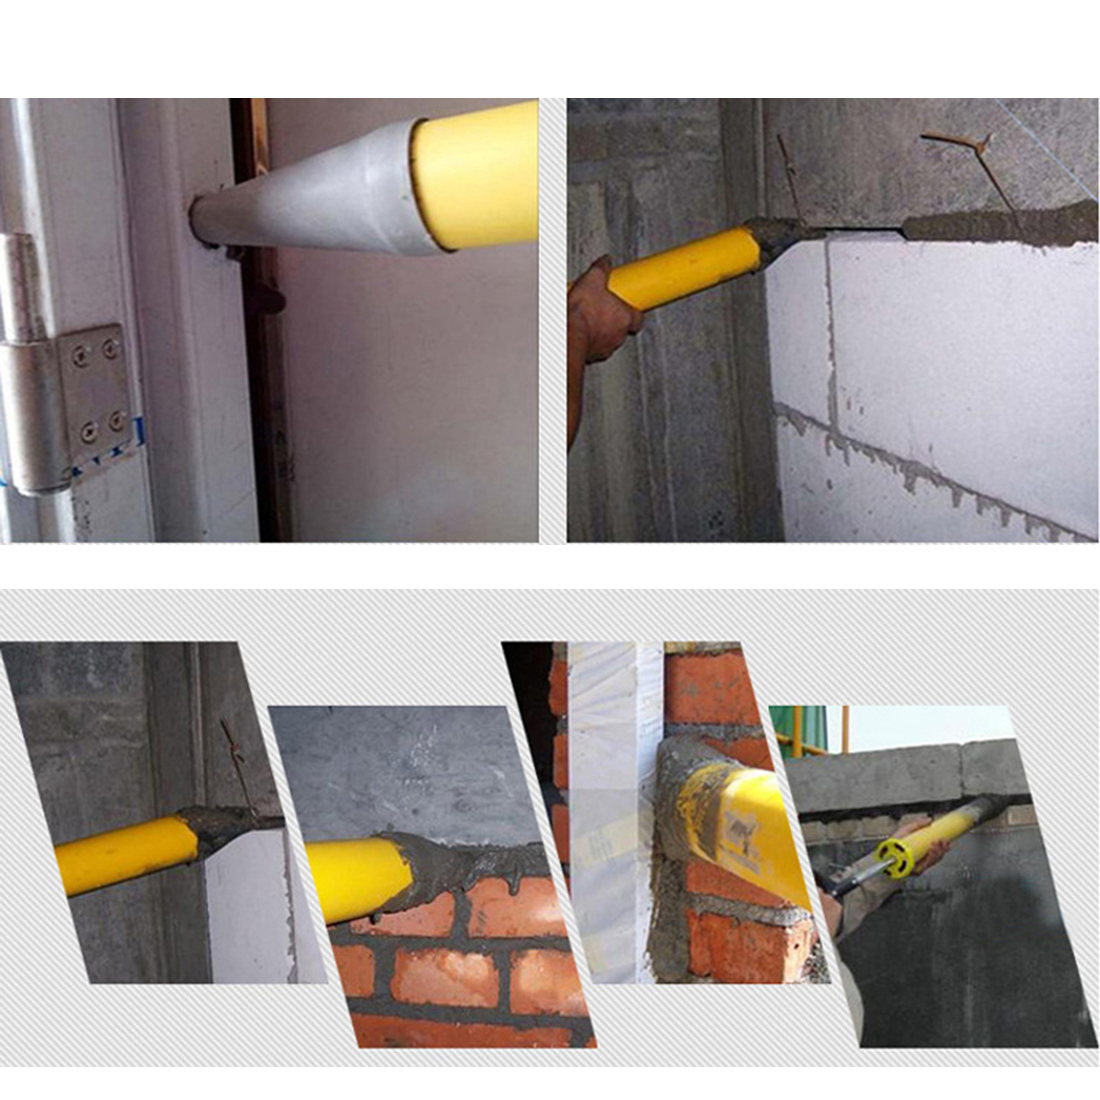 Caulking Gun Mayitr Pointing Brick Grouting Mortar Sprayer Applicator Tool For Cement Lime Wall Window Filling Tool Y30